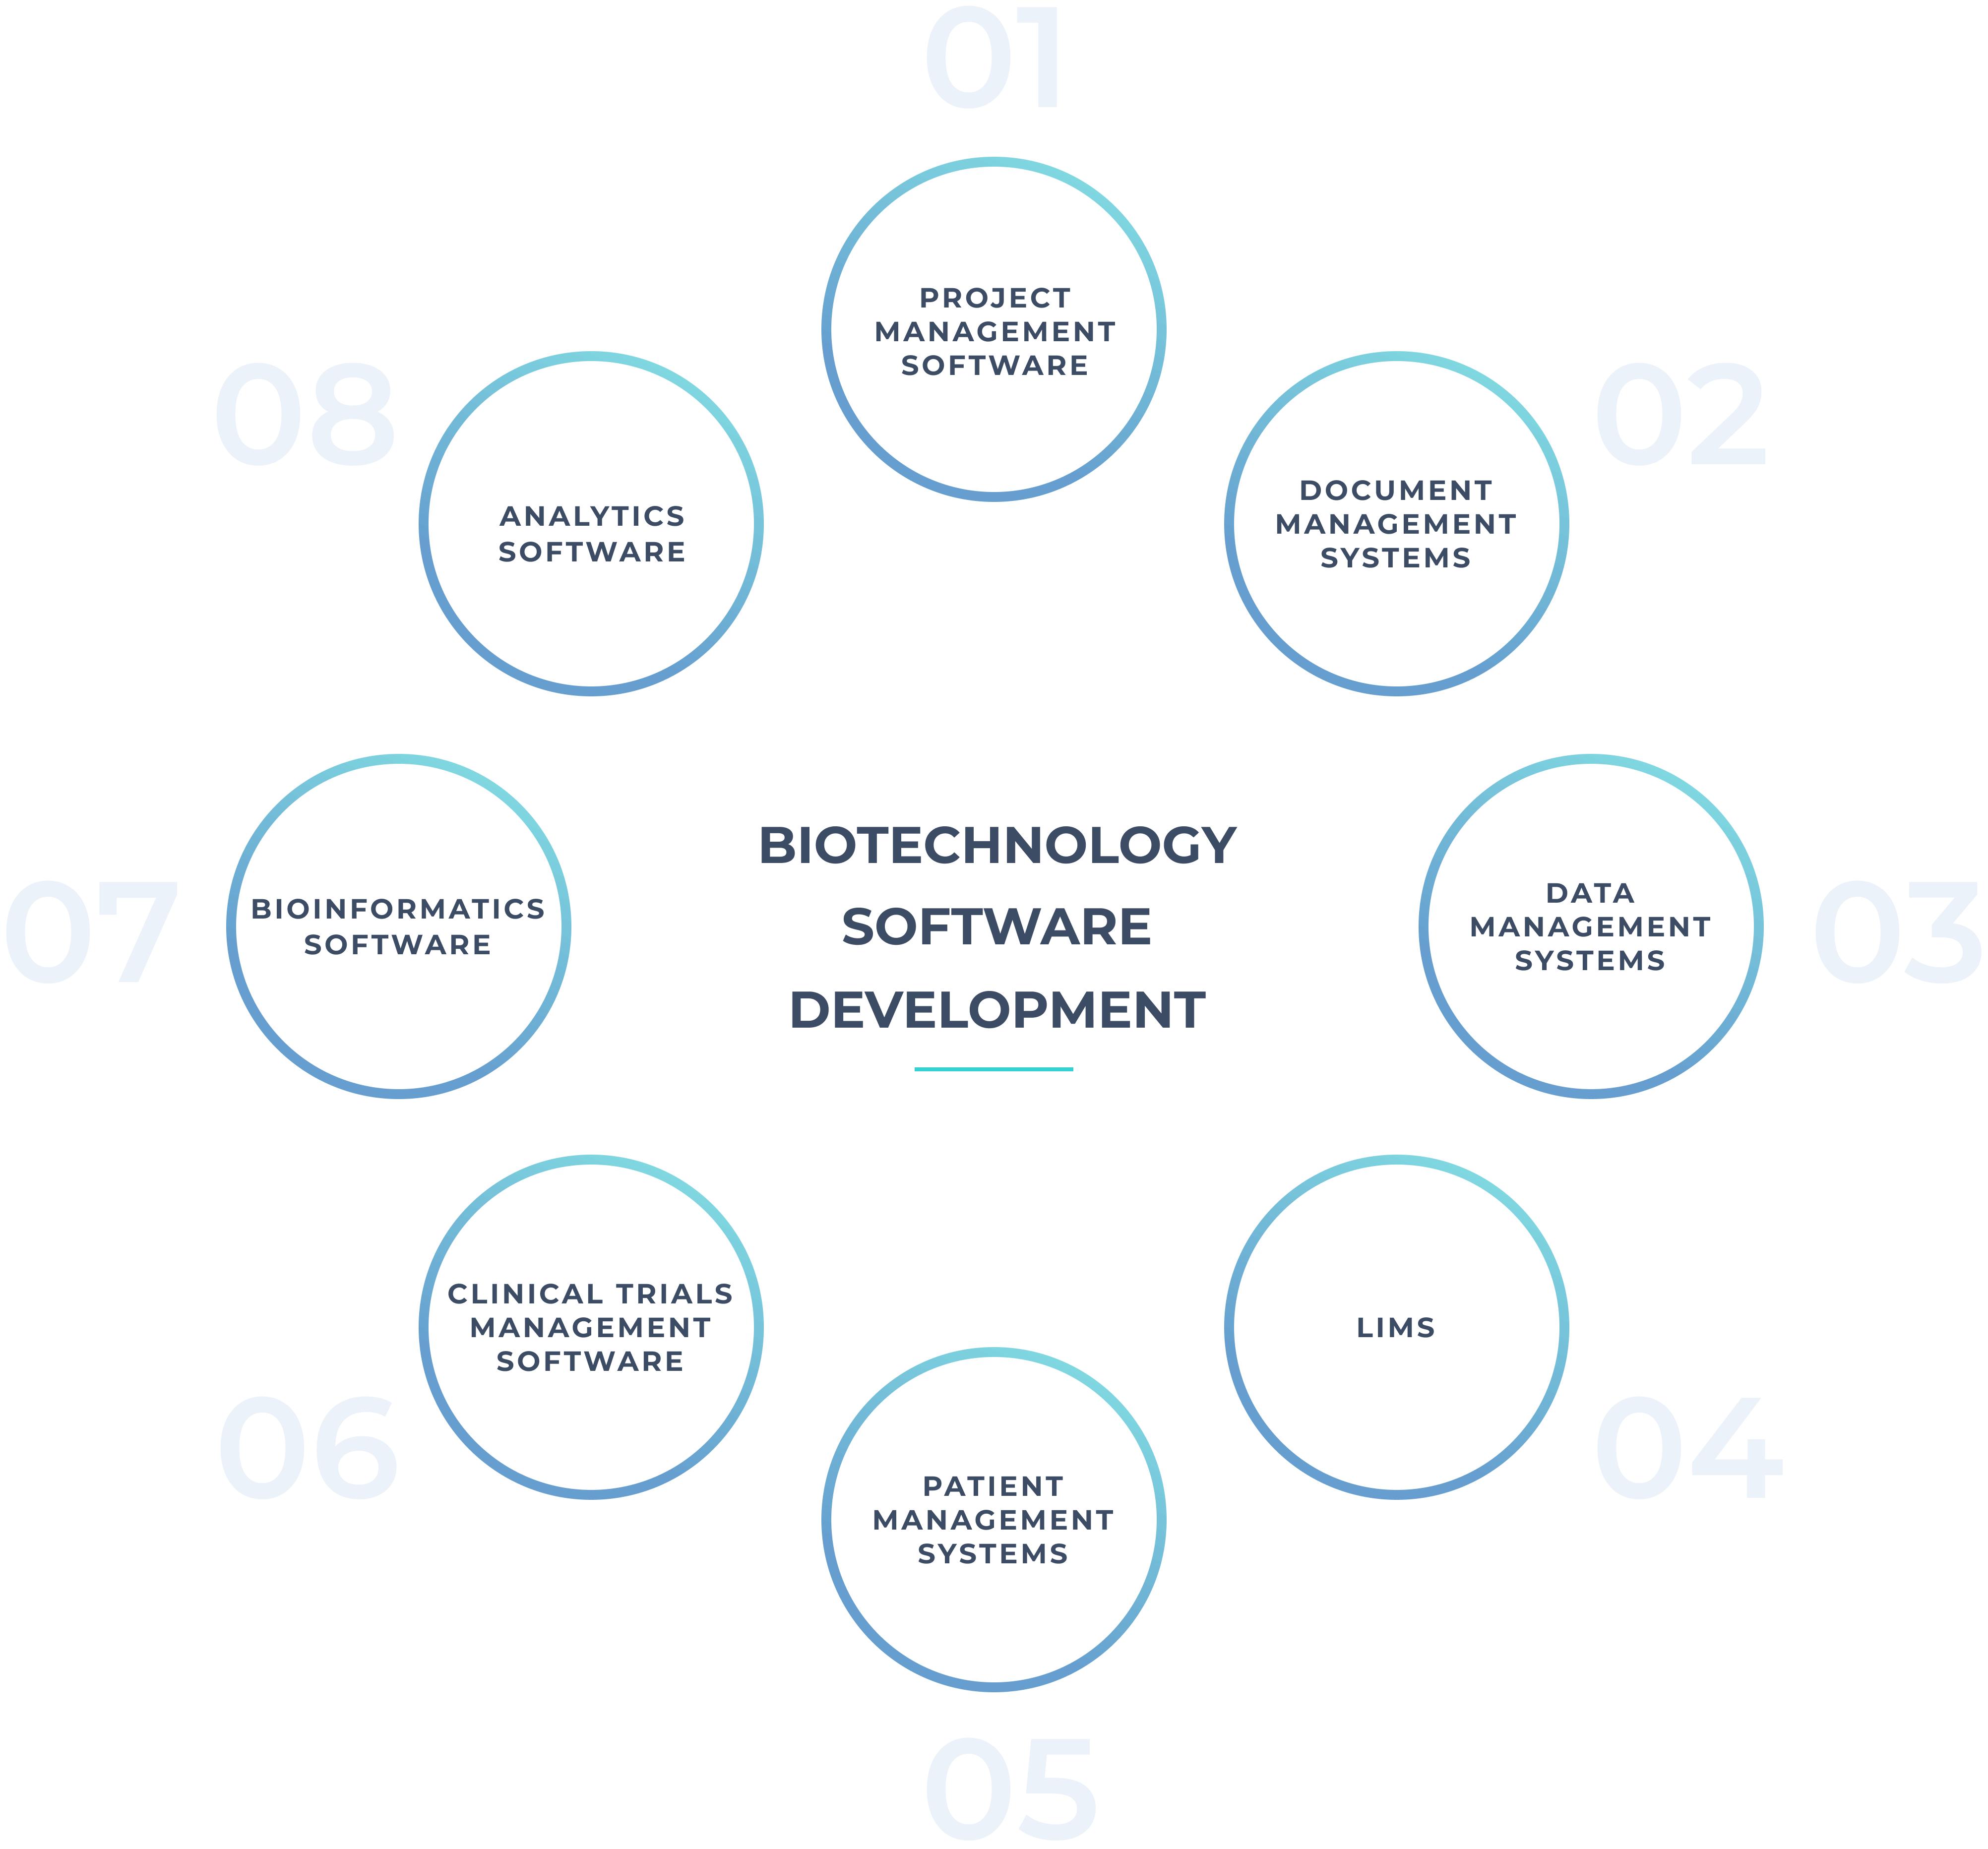 medical biotechnology software development